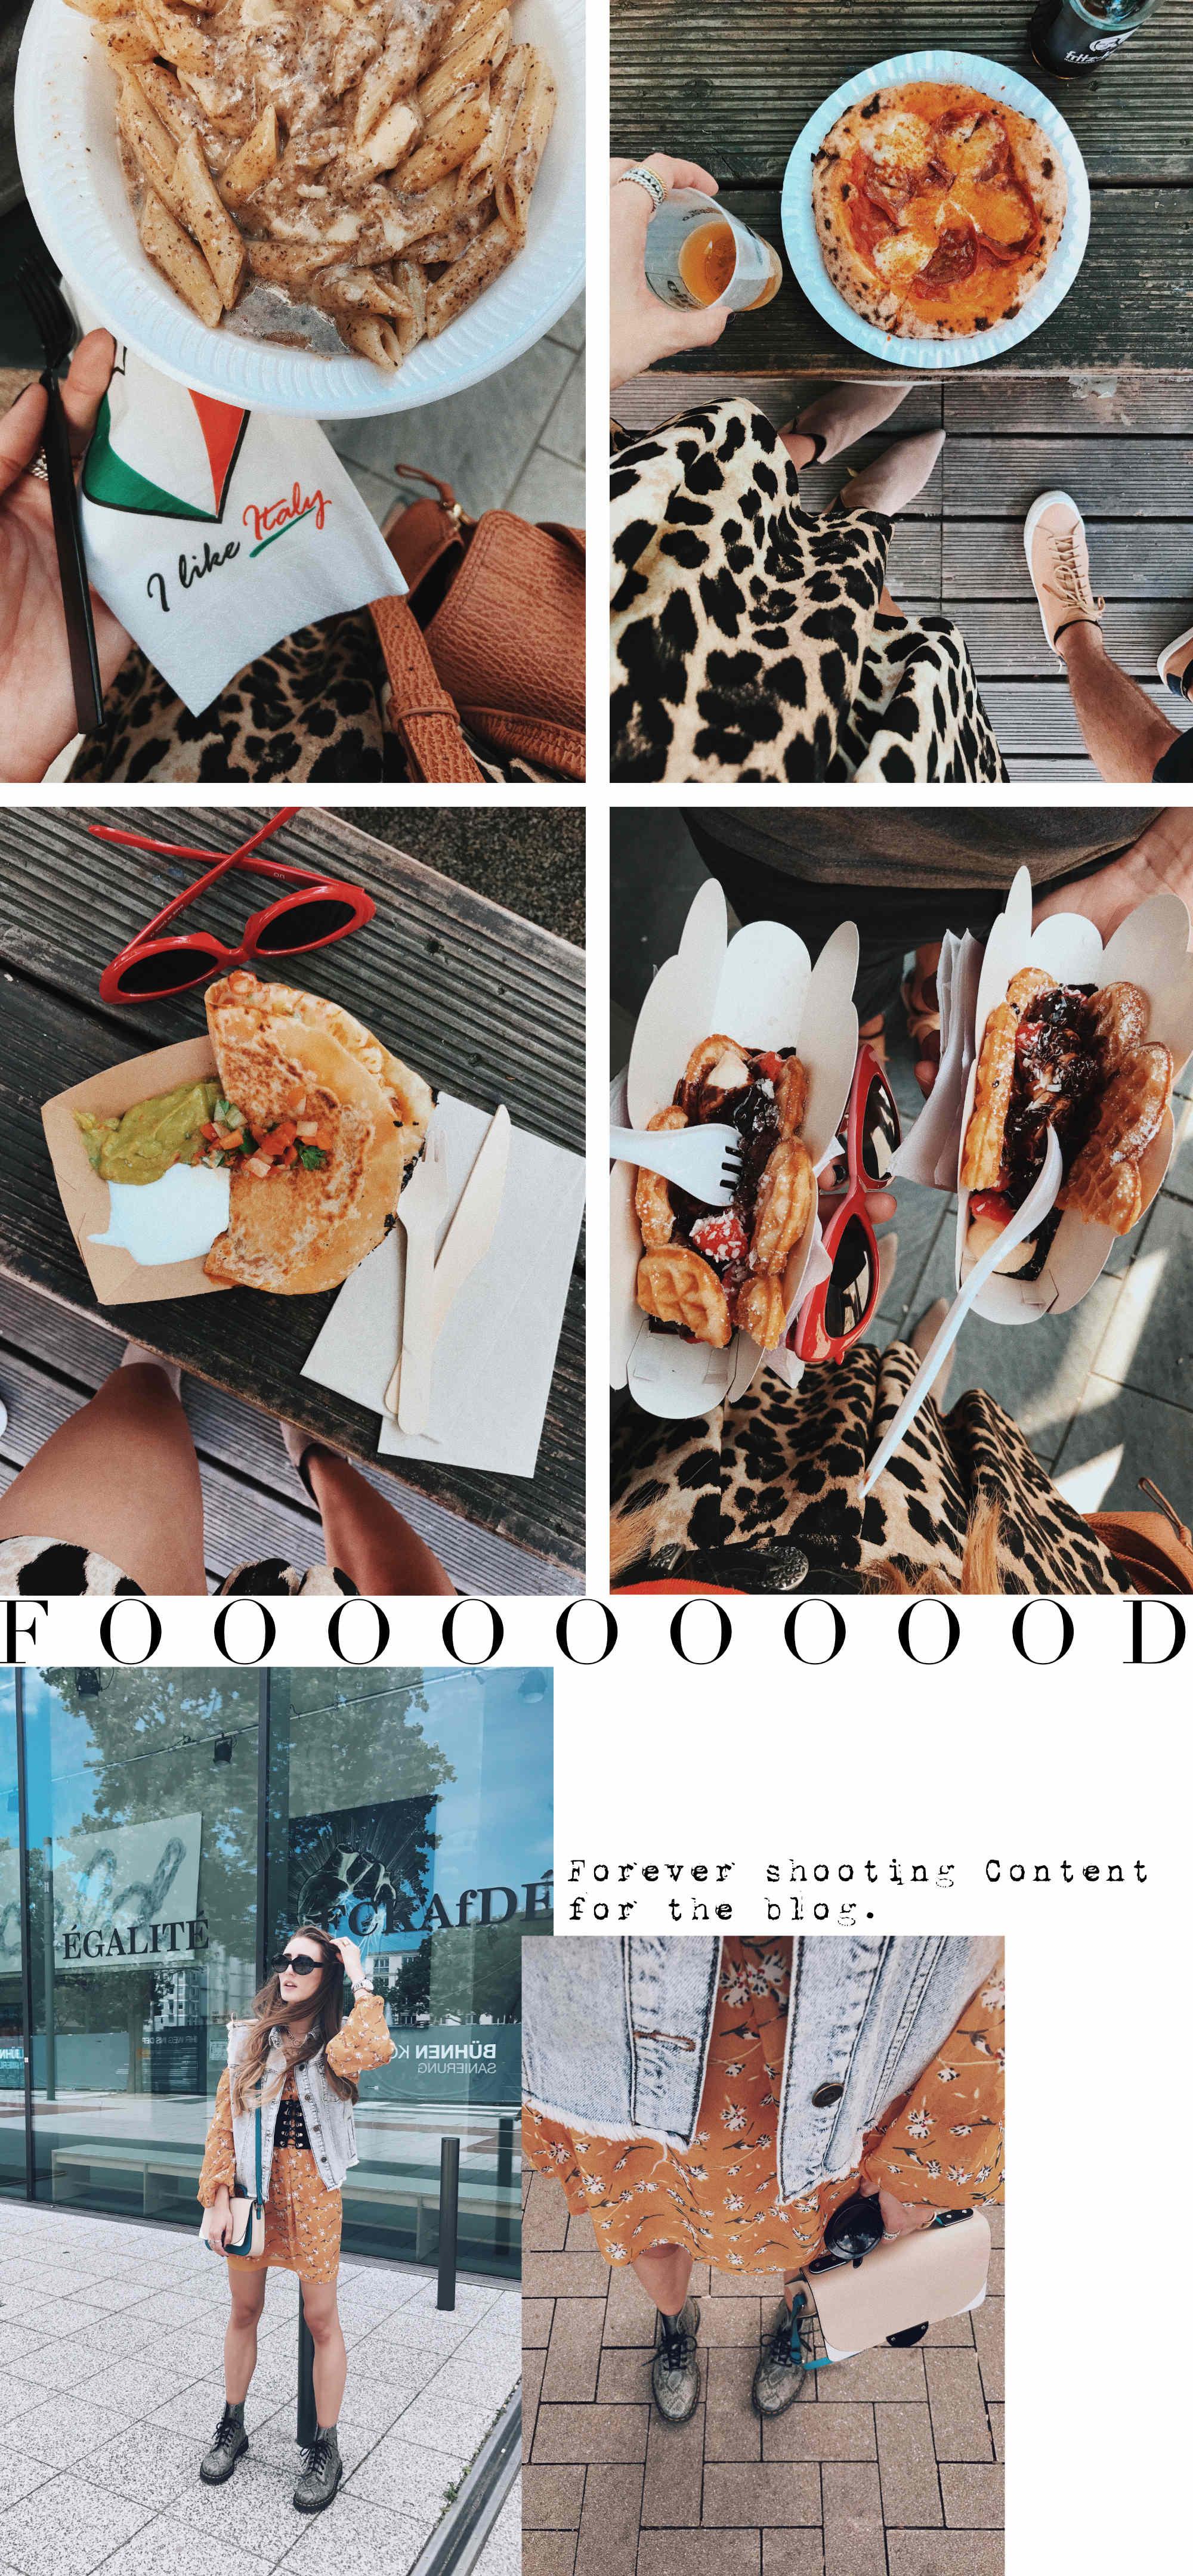 Vlog | Food Coma & Festival Photoshoot | Lisa Fiege